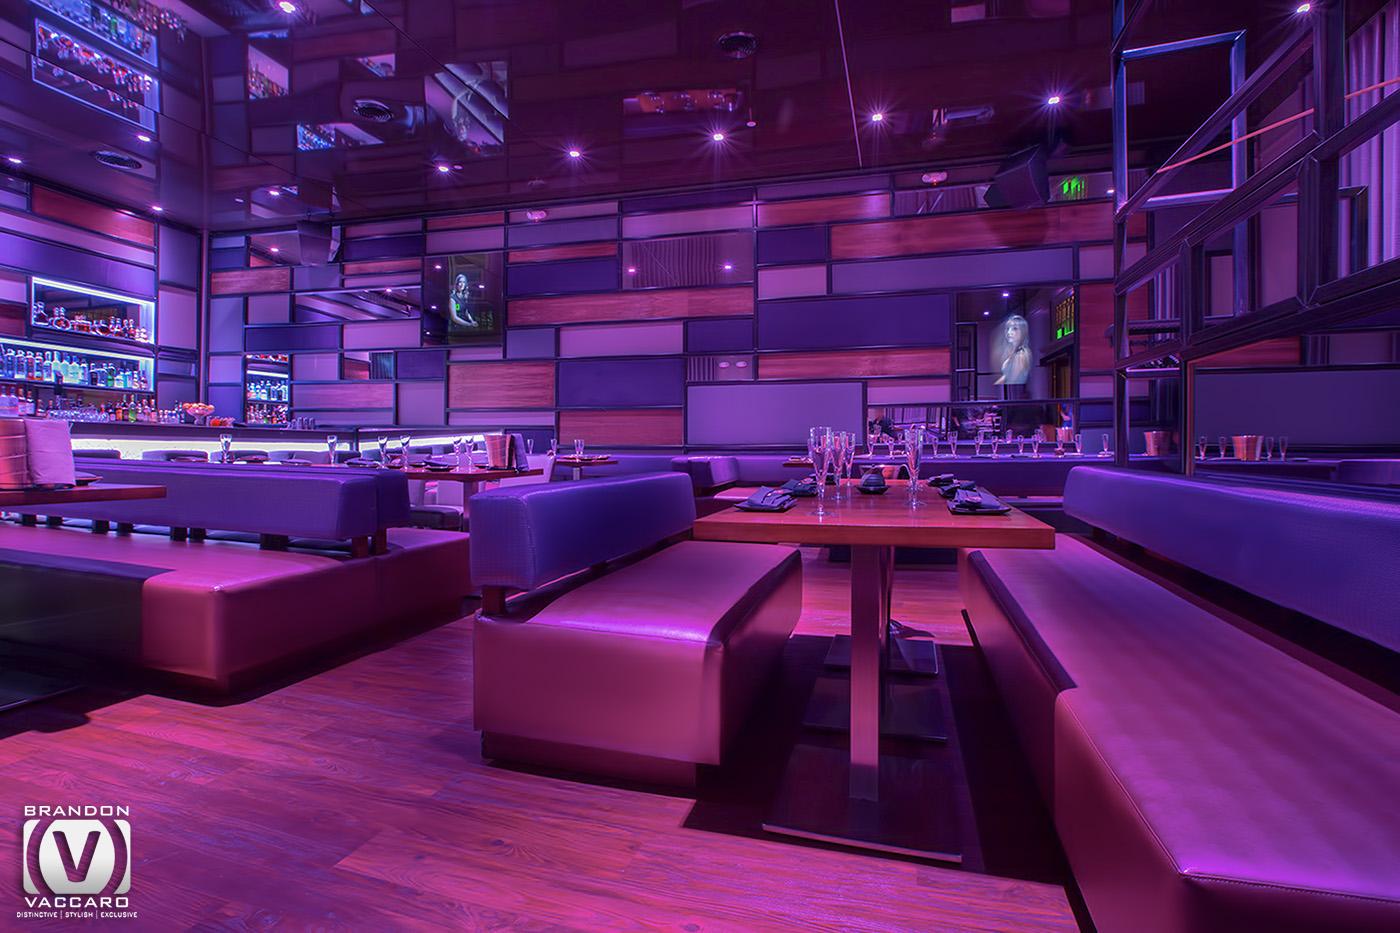 architecture-katsu-los-gatos-interior-main-dining-room-1.jpg